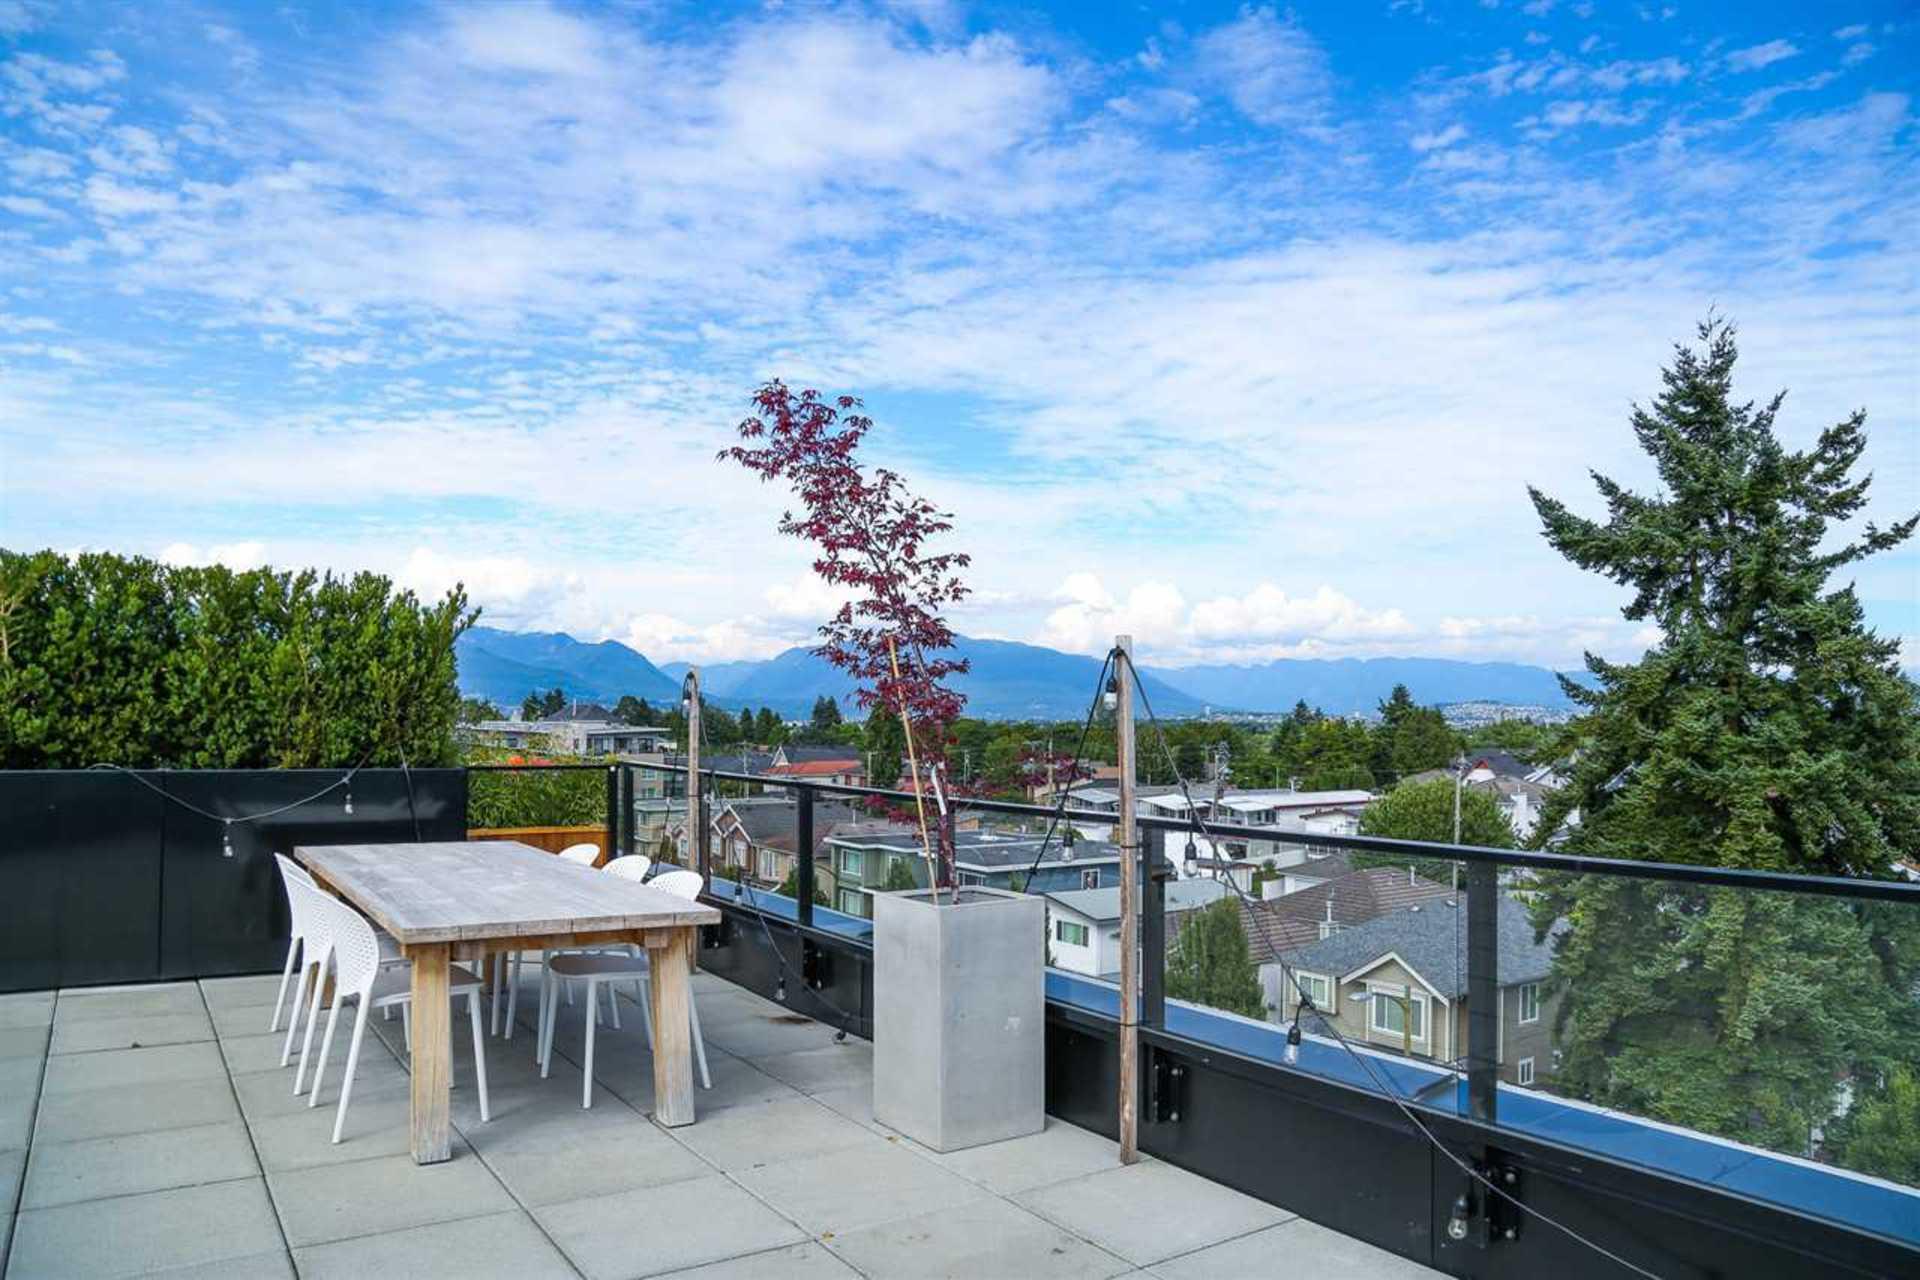 5085-main-street-main-vancouver-east-17 at 602 - 5085 Main Street, Main, Vancouver East